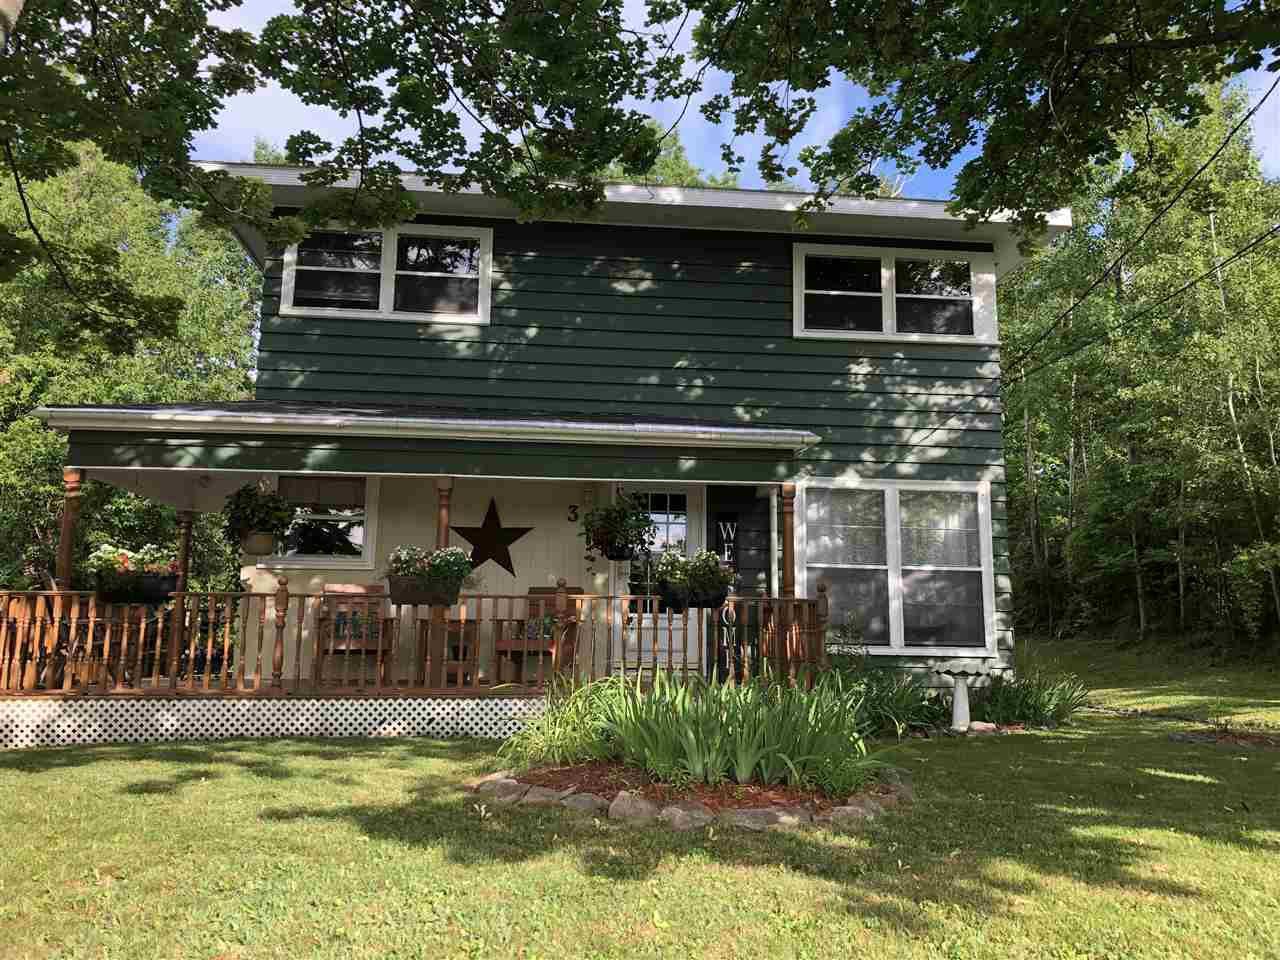 Main Photo: 38 SEVENTH Street in Trenton: 107-Trenton,Westville,Pictou Residential for sale (Northern Region)  : MLS®# 202015189